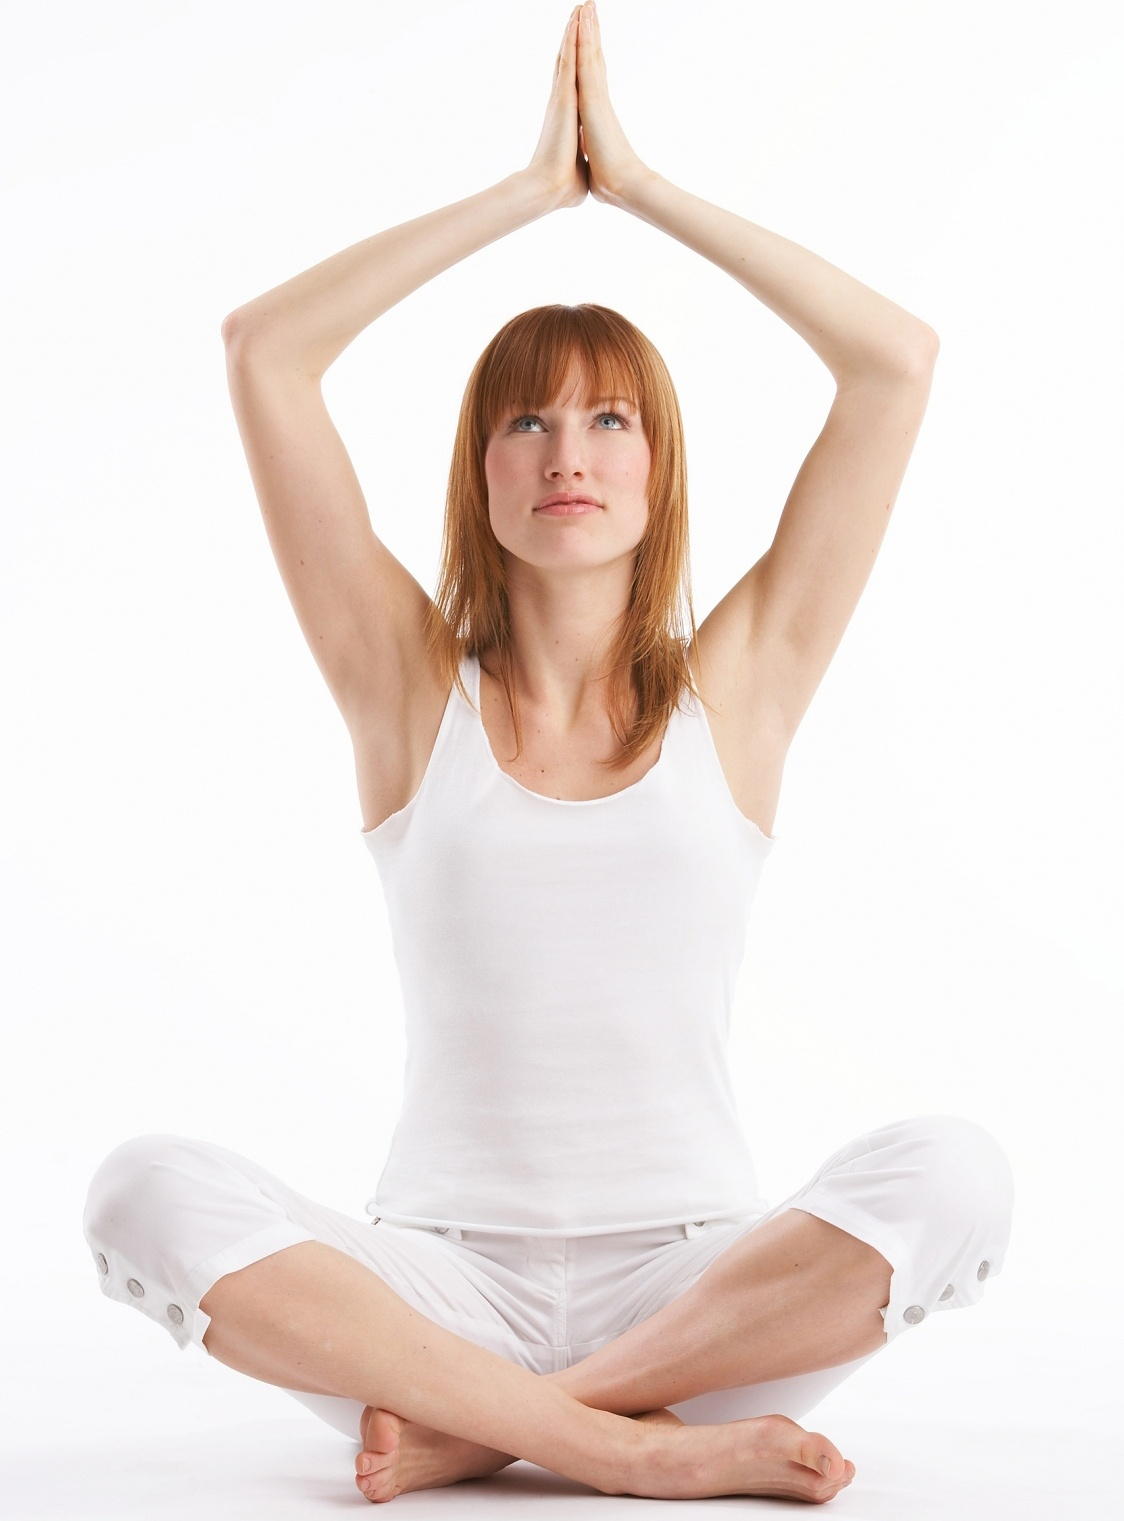 Yoga Icons Download 3 Free Yoga Icon Page 1 - Yoga PNG